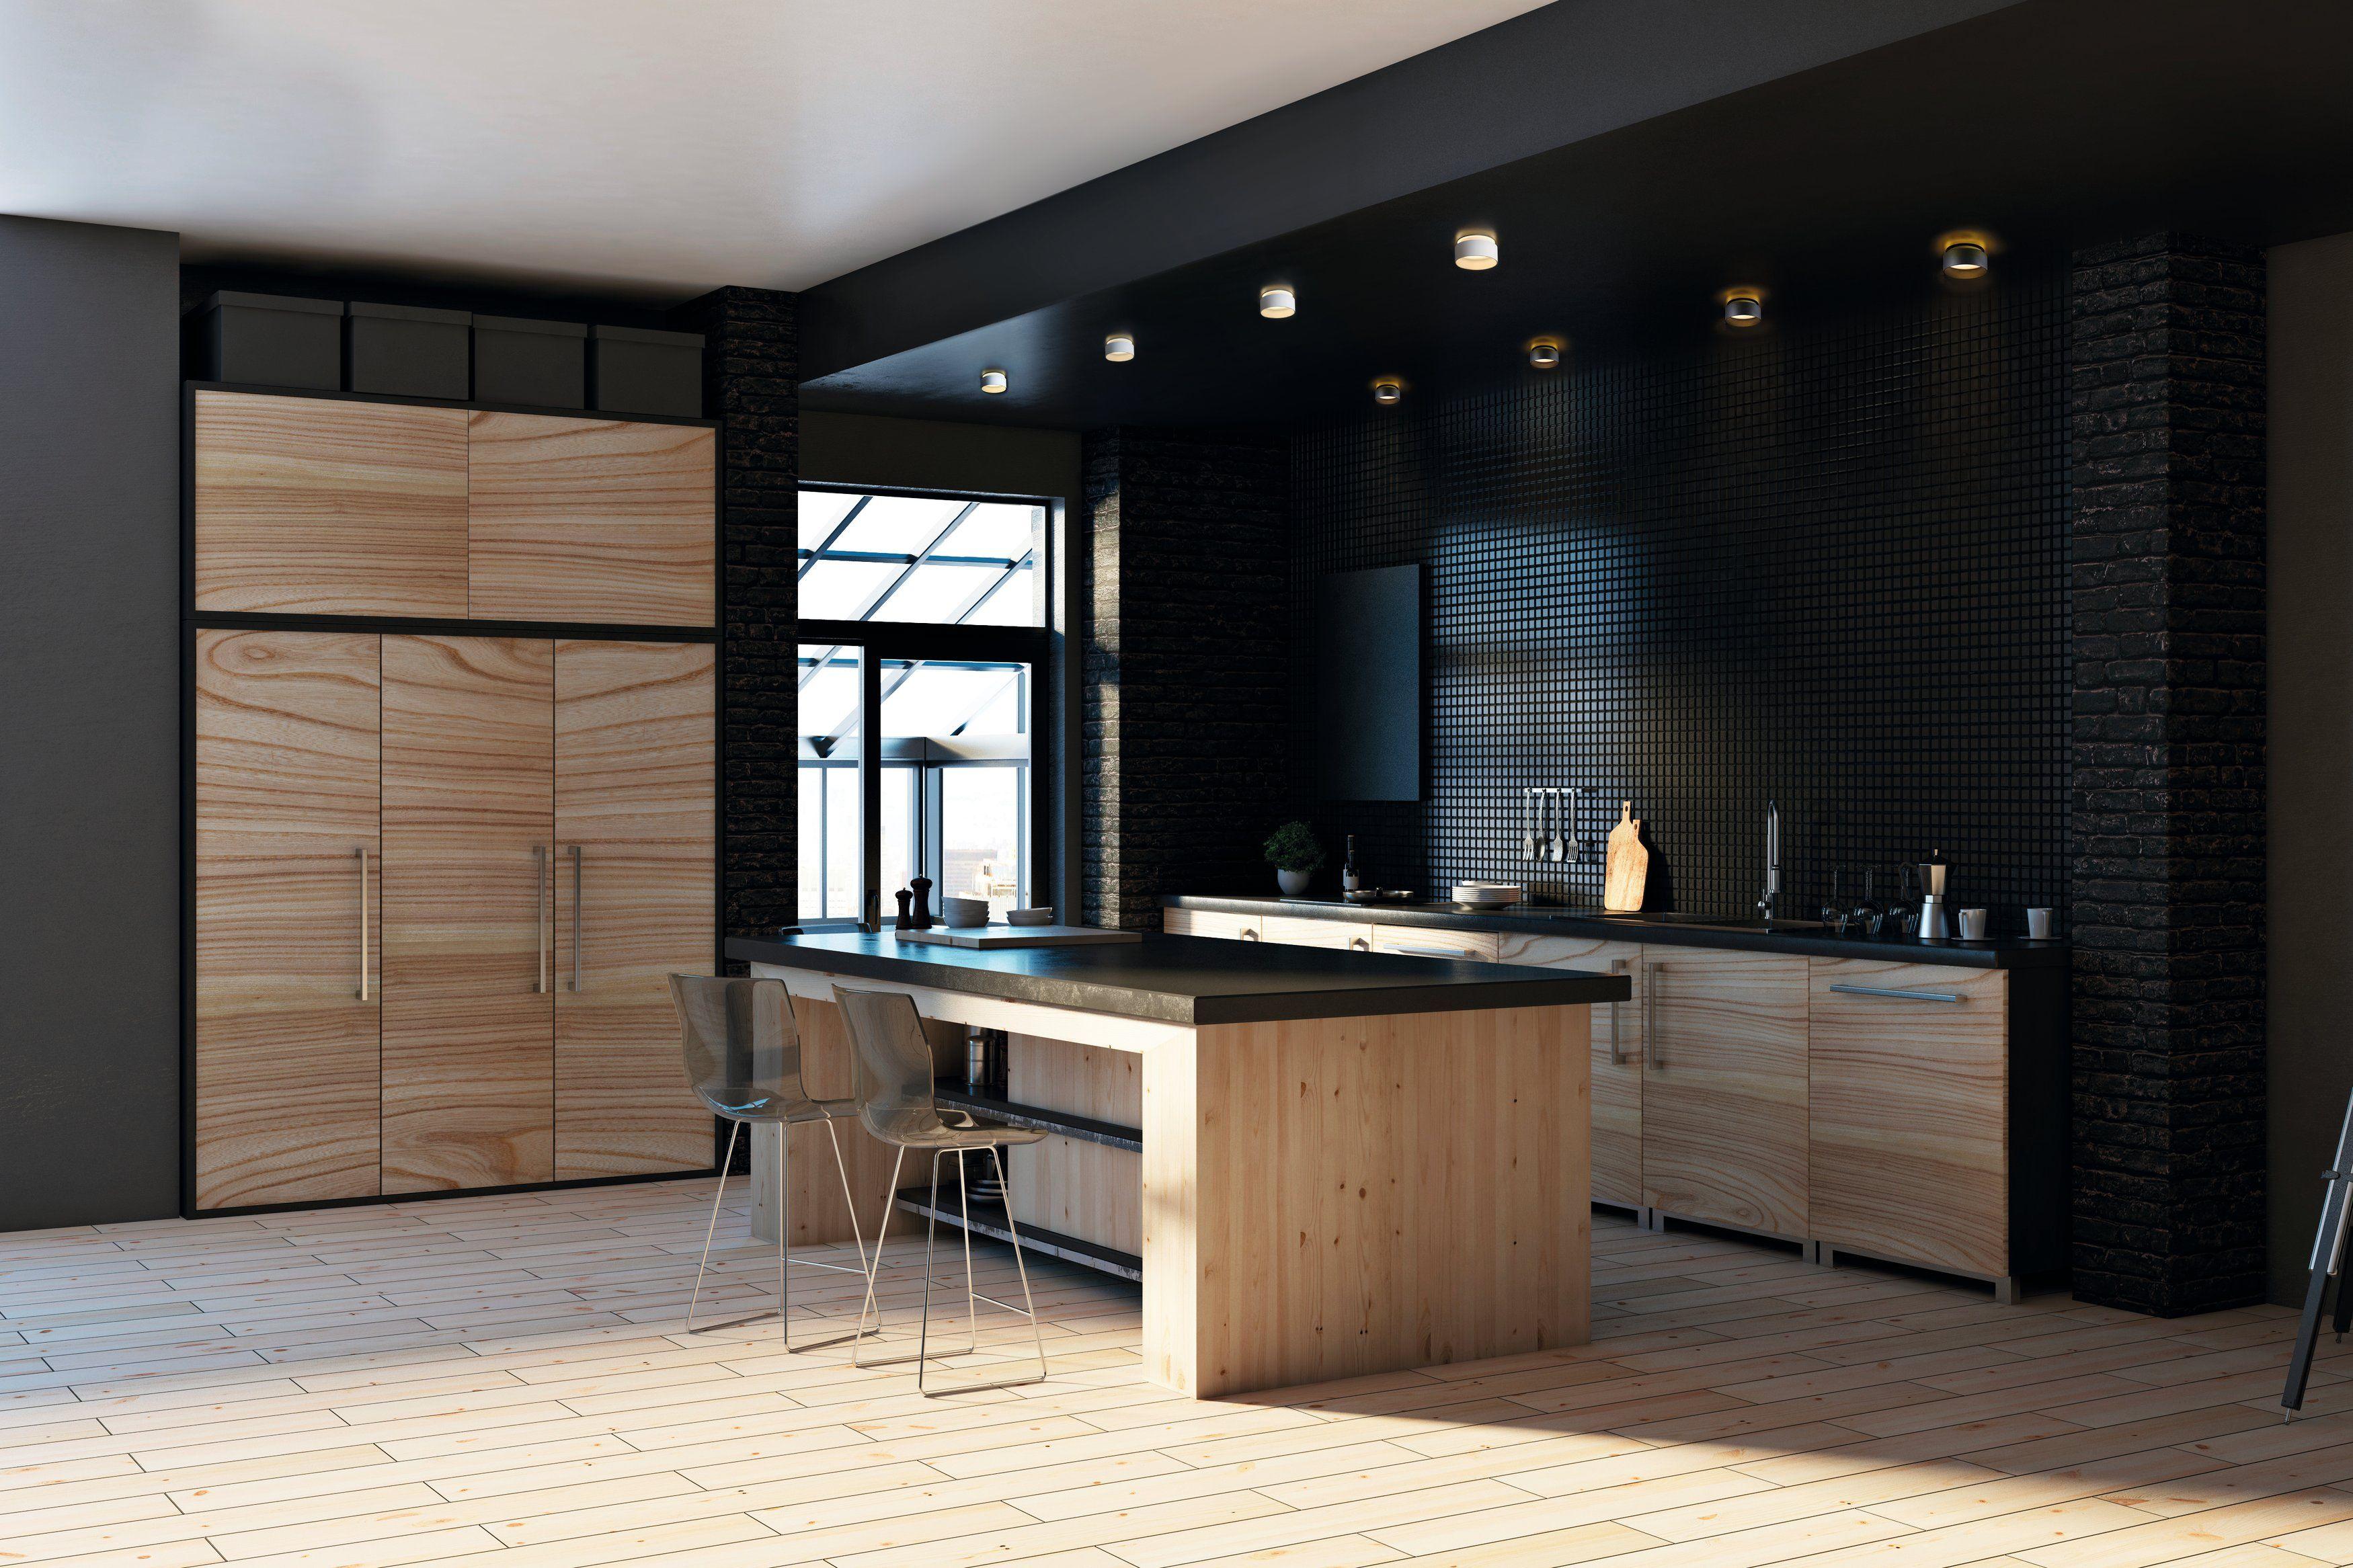 Elegancka Czarna Kuchnia Z Wyspa I Punktowym Oswietleniem Small Kitchen Modern Kitchen Kitchen Design Small